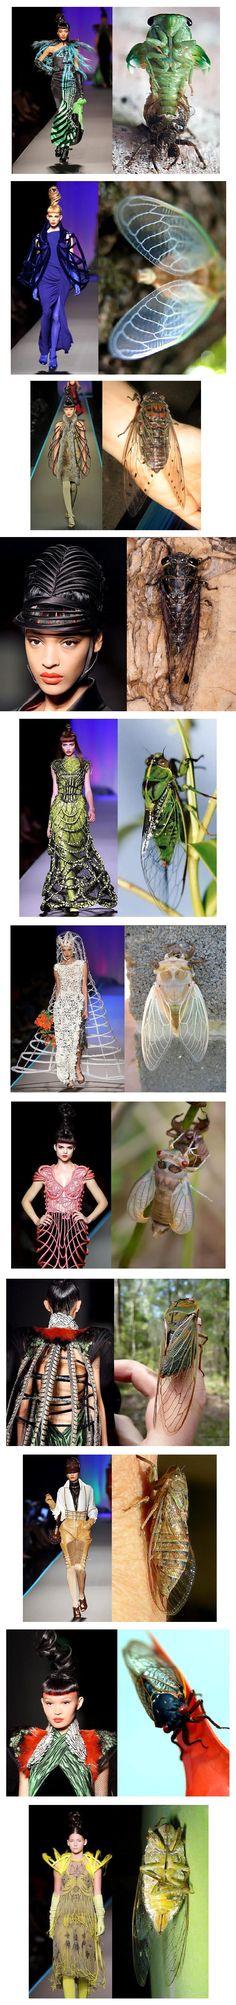 cool Jean Paul Gaultier   Metamorphosis 2014   senatus.net/......